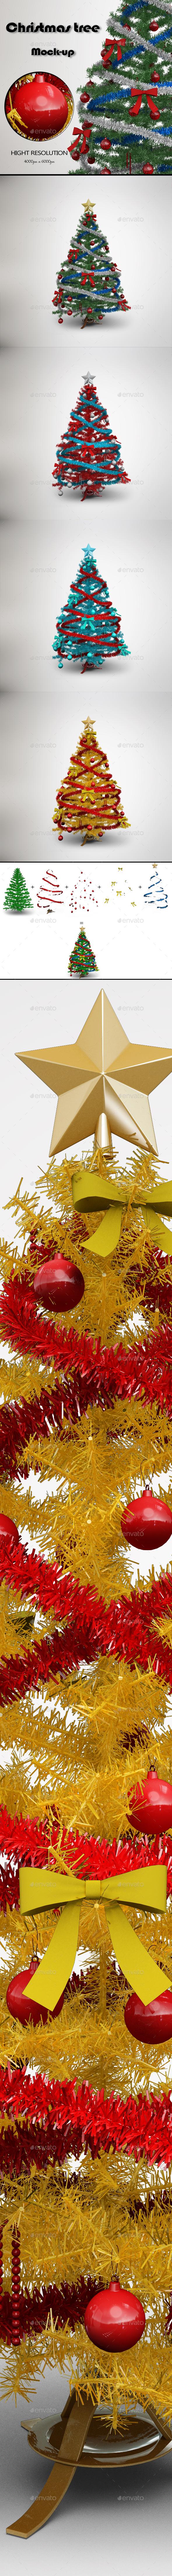 Christmas Tree MockUp - Miscellaneous 3D Renders